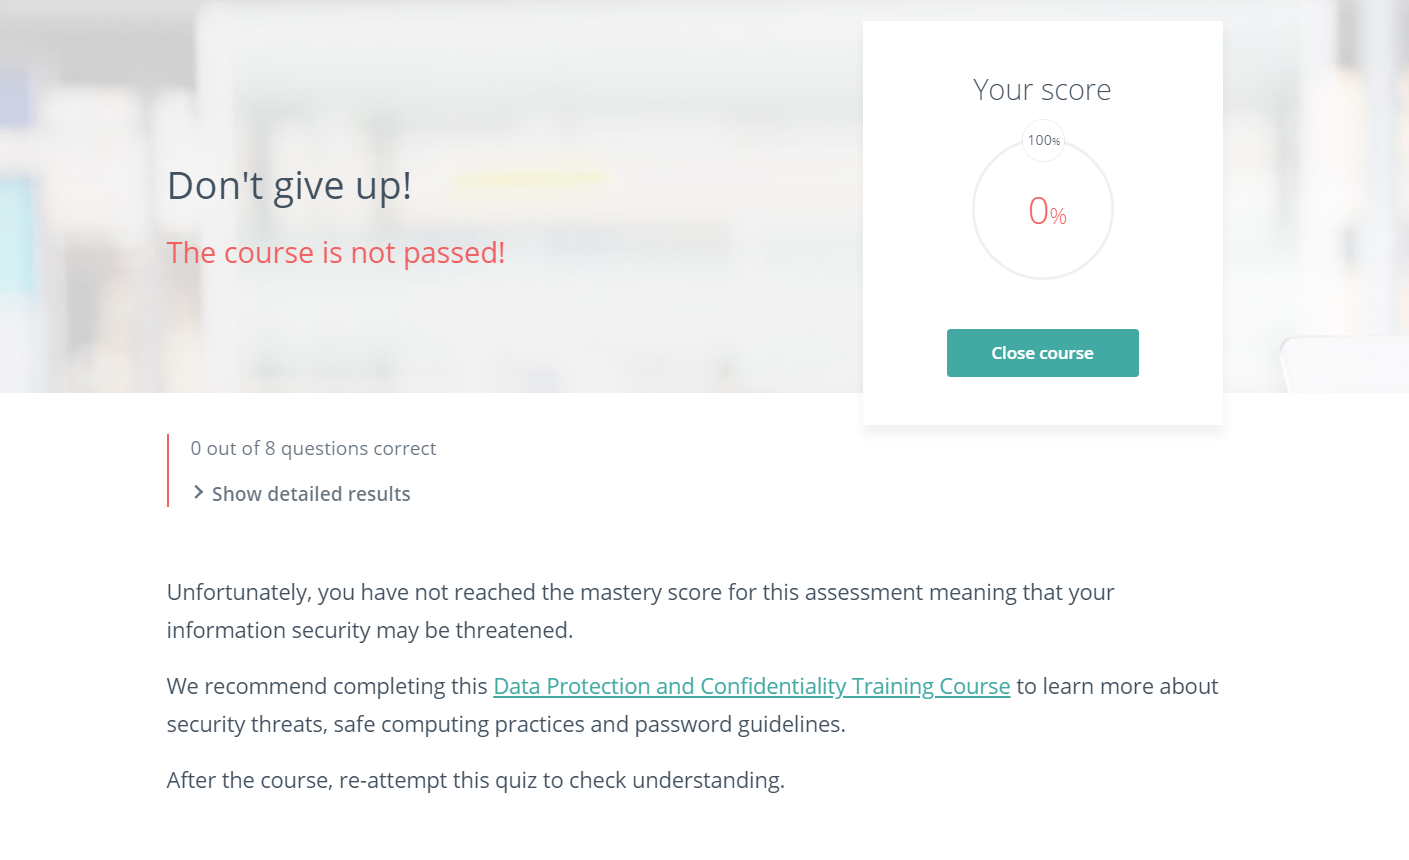 Course failed